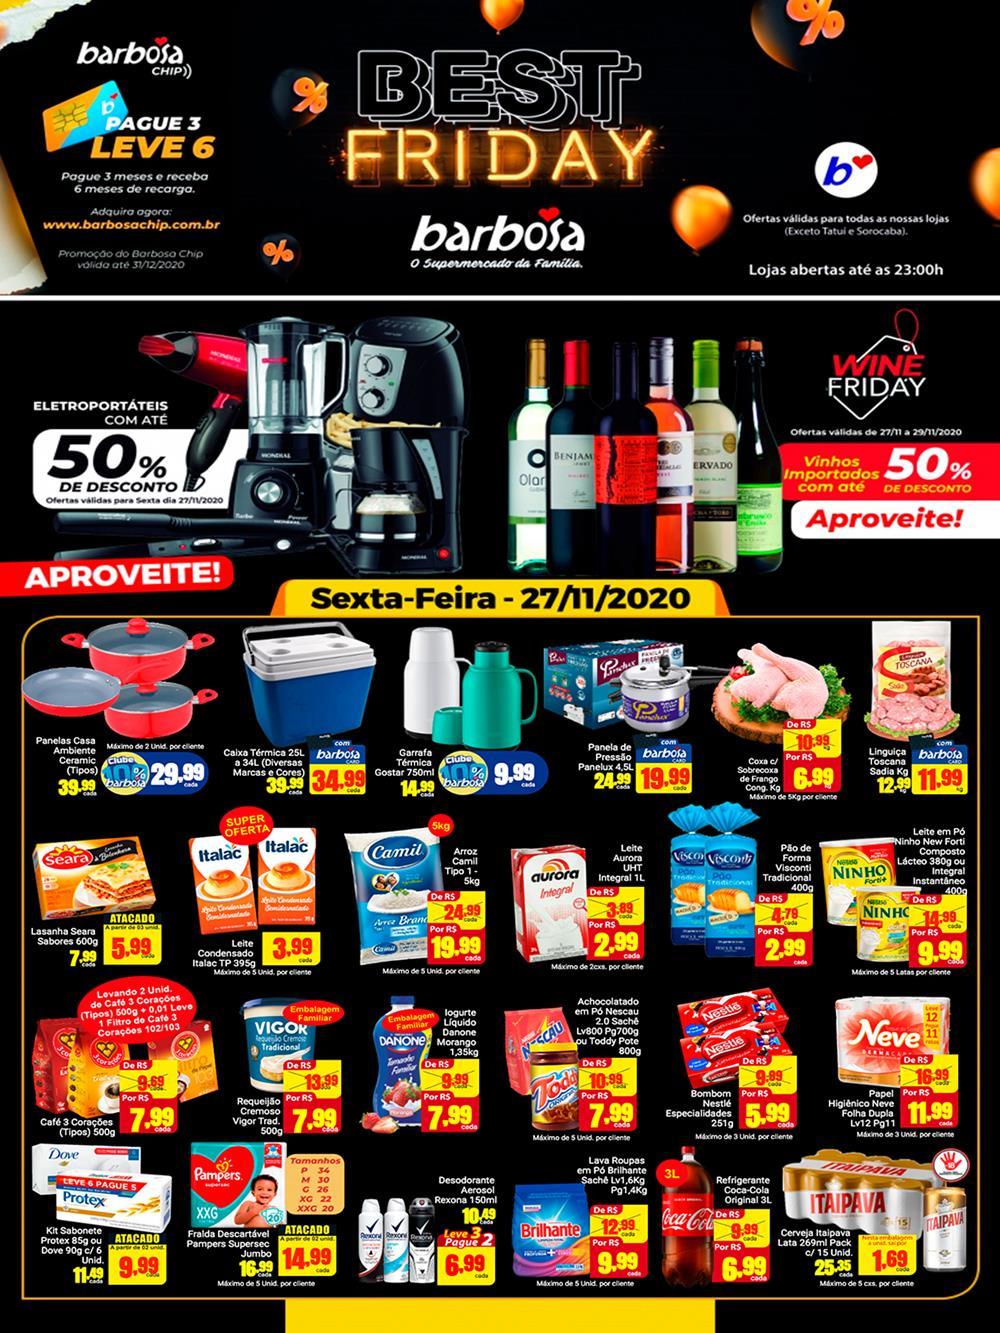 blackfriday-barbosa-ofertas-descontos-hoje1 Black Friday Ofertas de supermercados